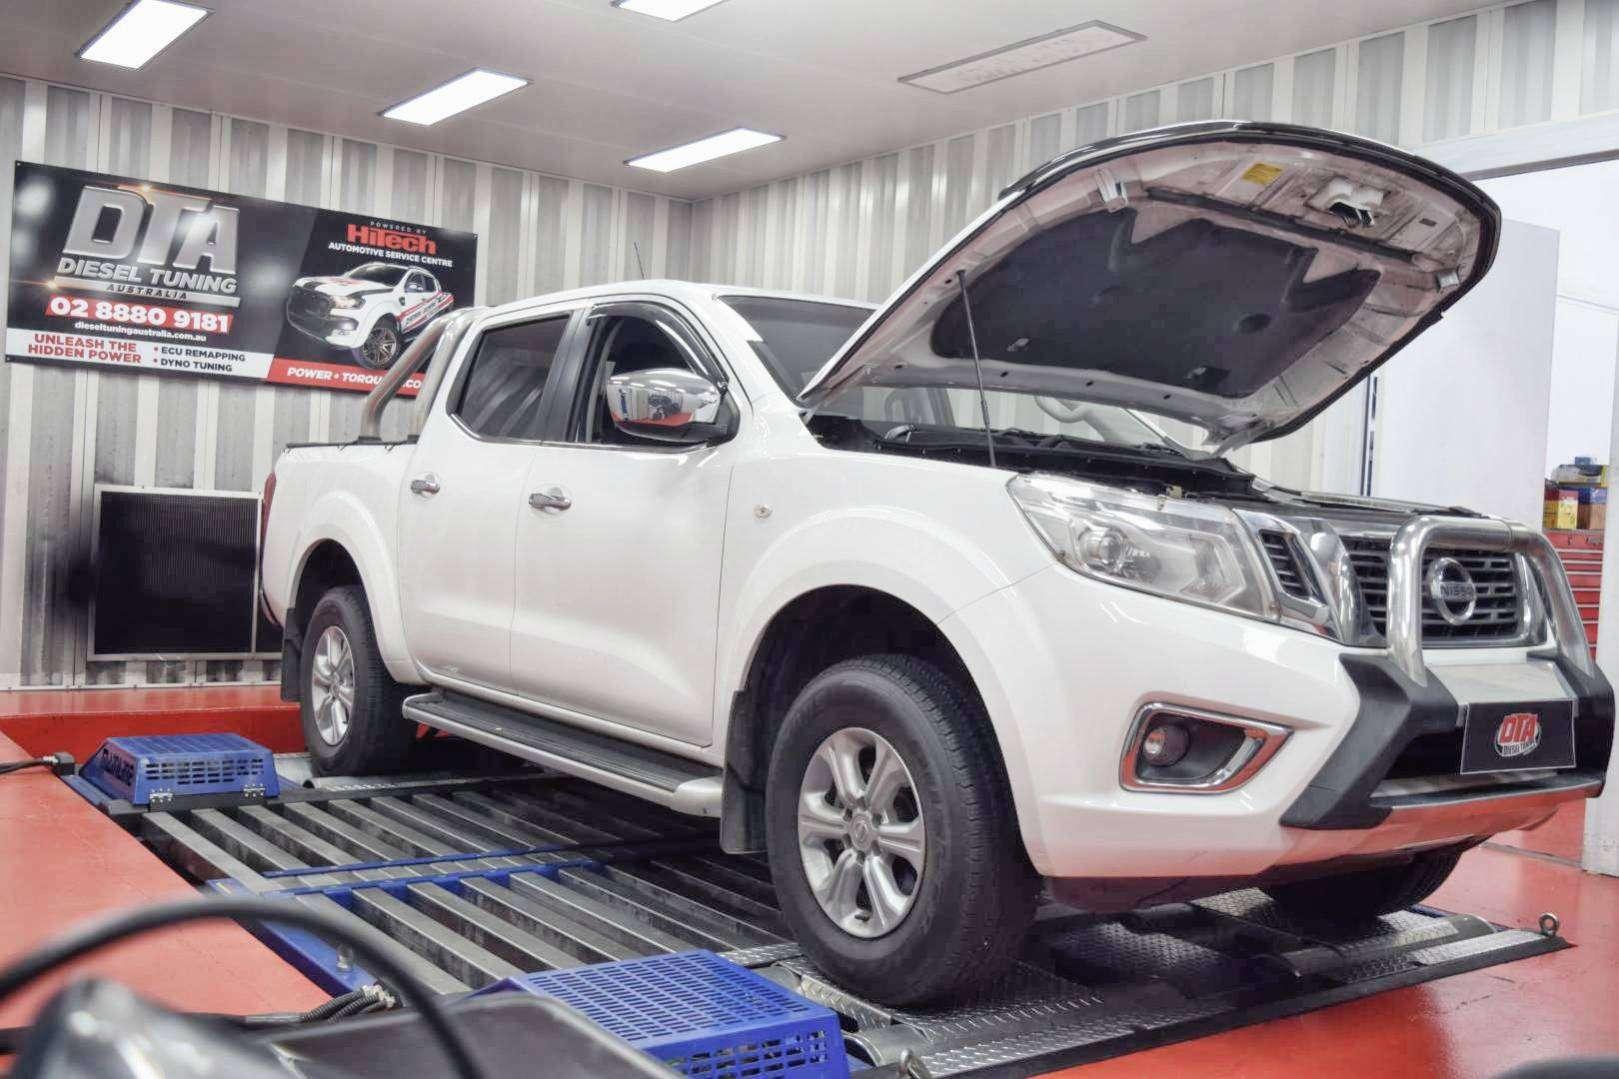 Hyundai i30 1 6L 100 kW ECU REMAP - Diesel tuning specialist